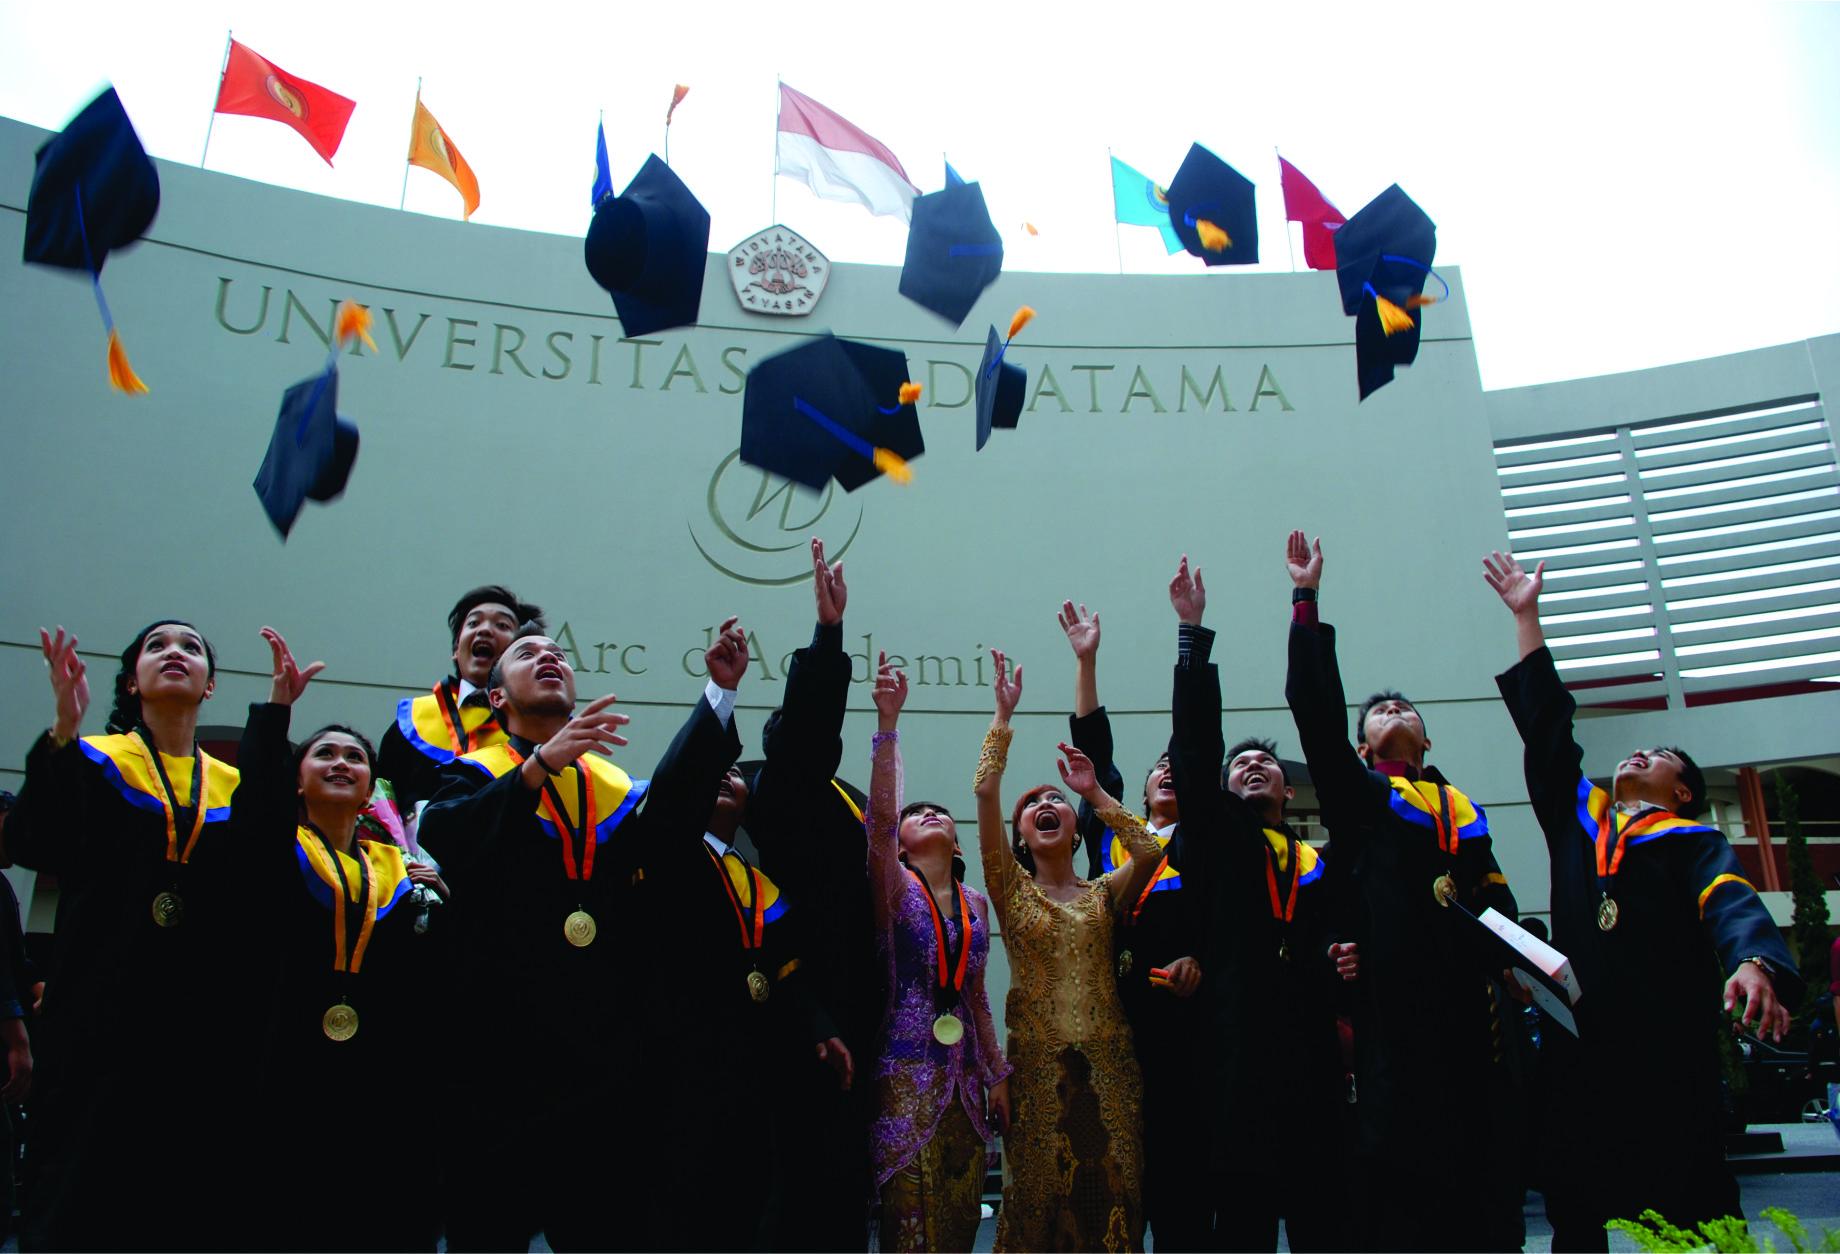 Biaya Kuliah S2 Kelas Karyawan Universitas Widyatama Bandung 2017